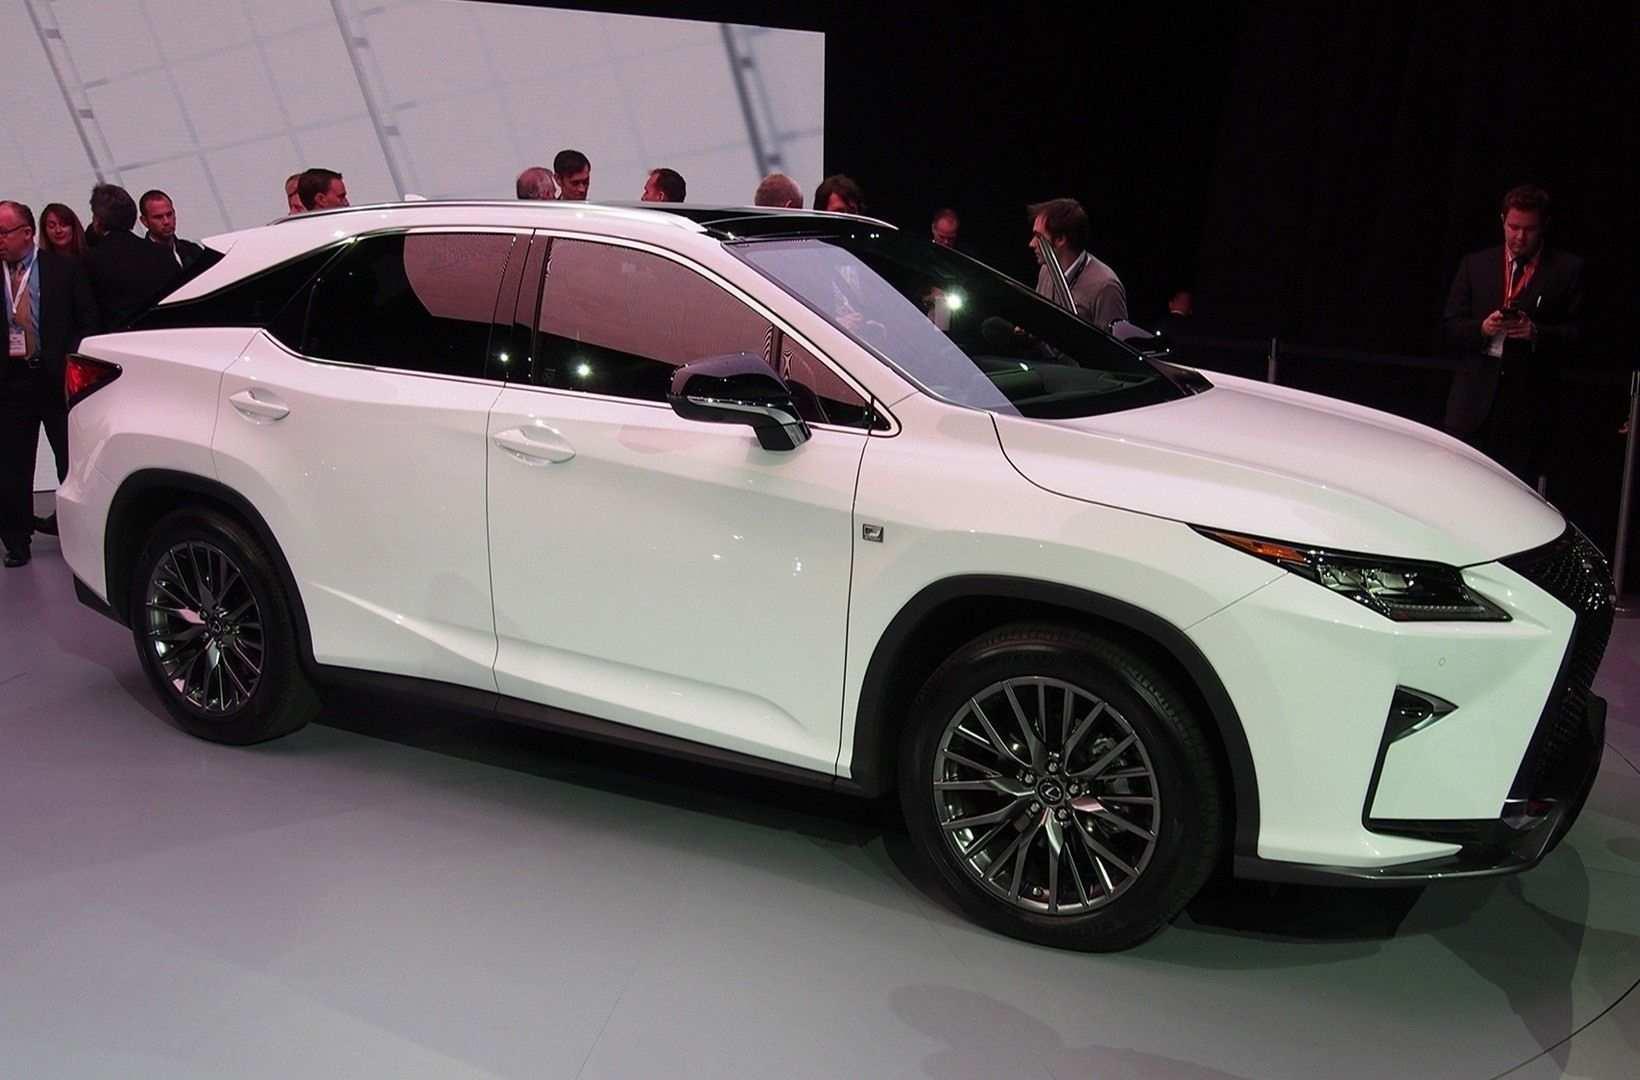 41 All New Lexus Sc 2020 Images with Lexus Sc 2020